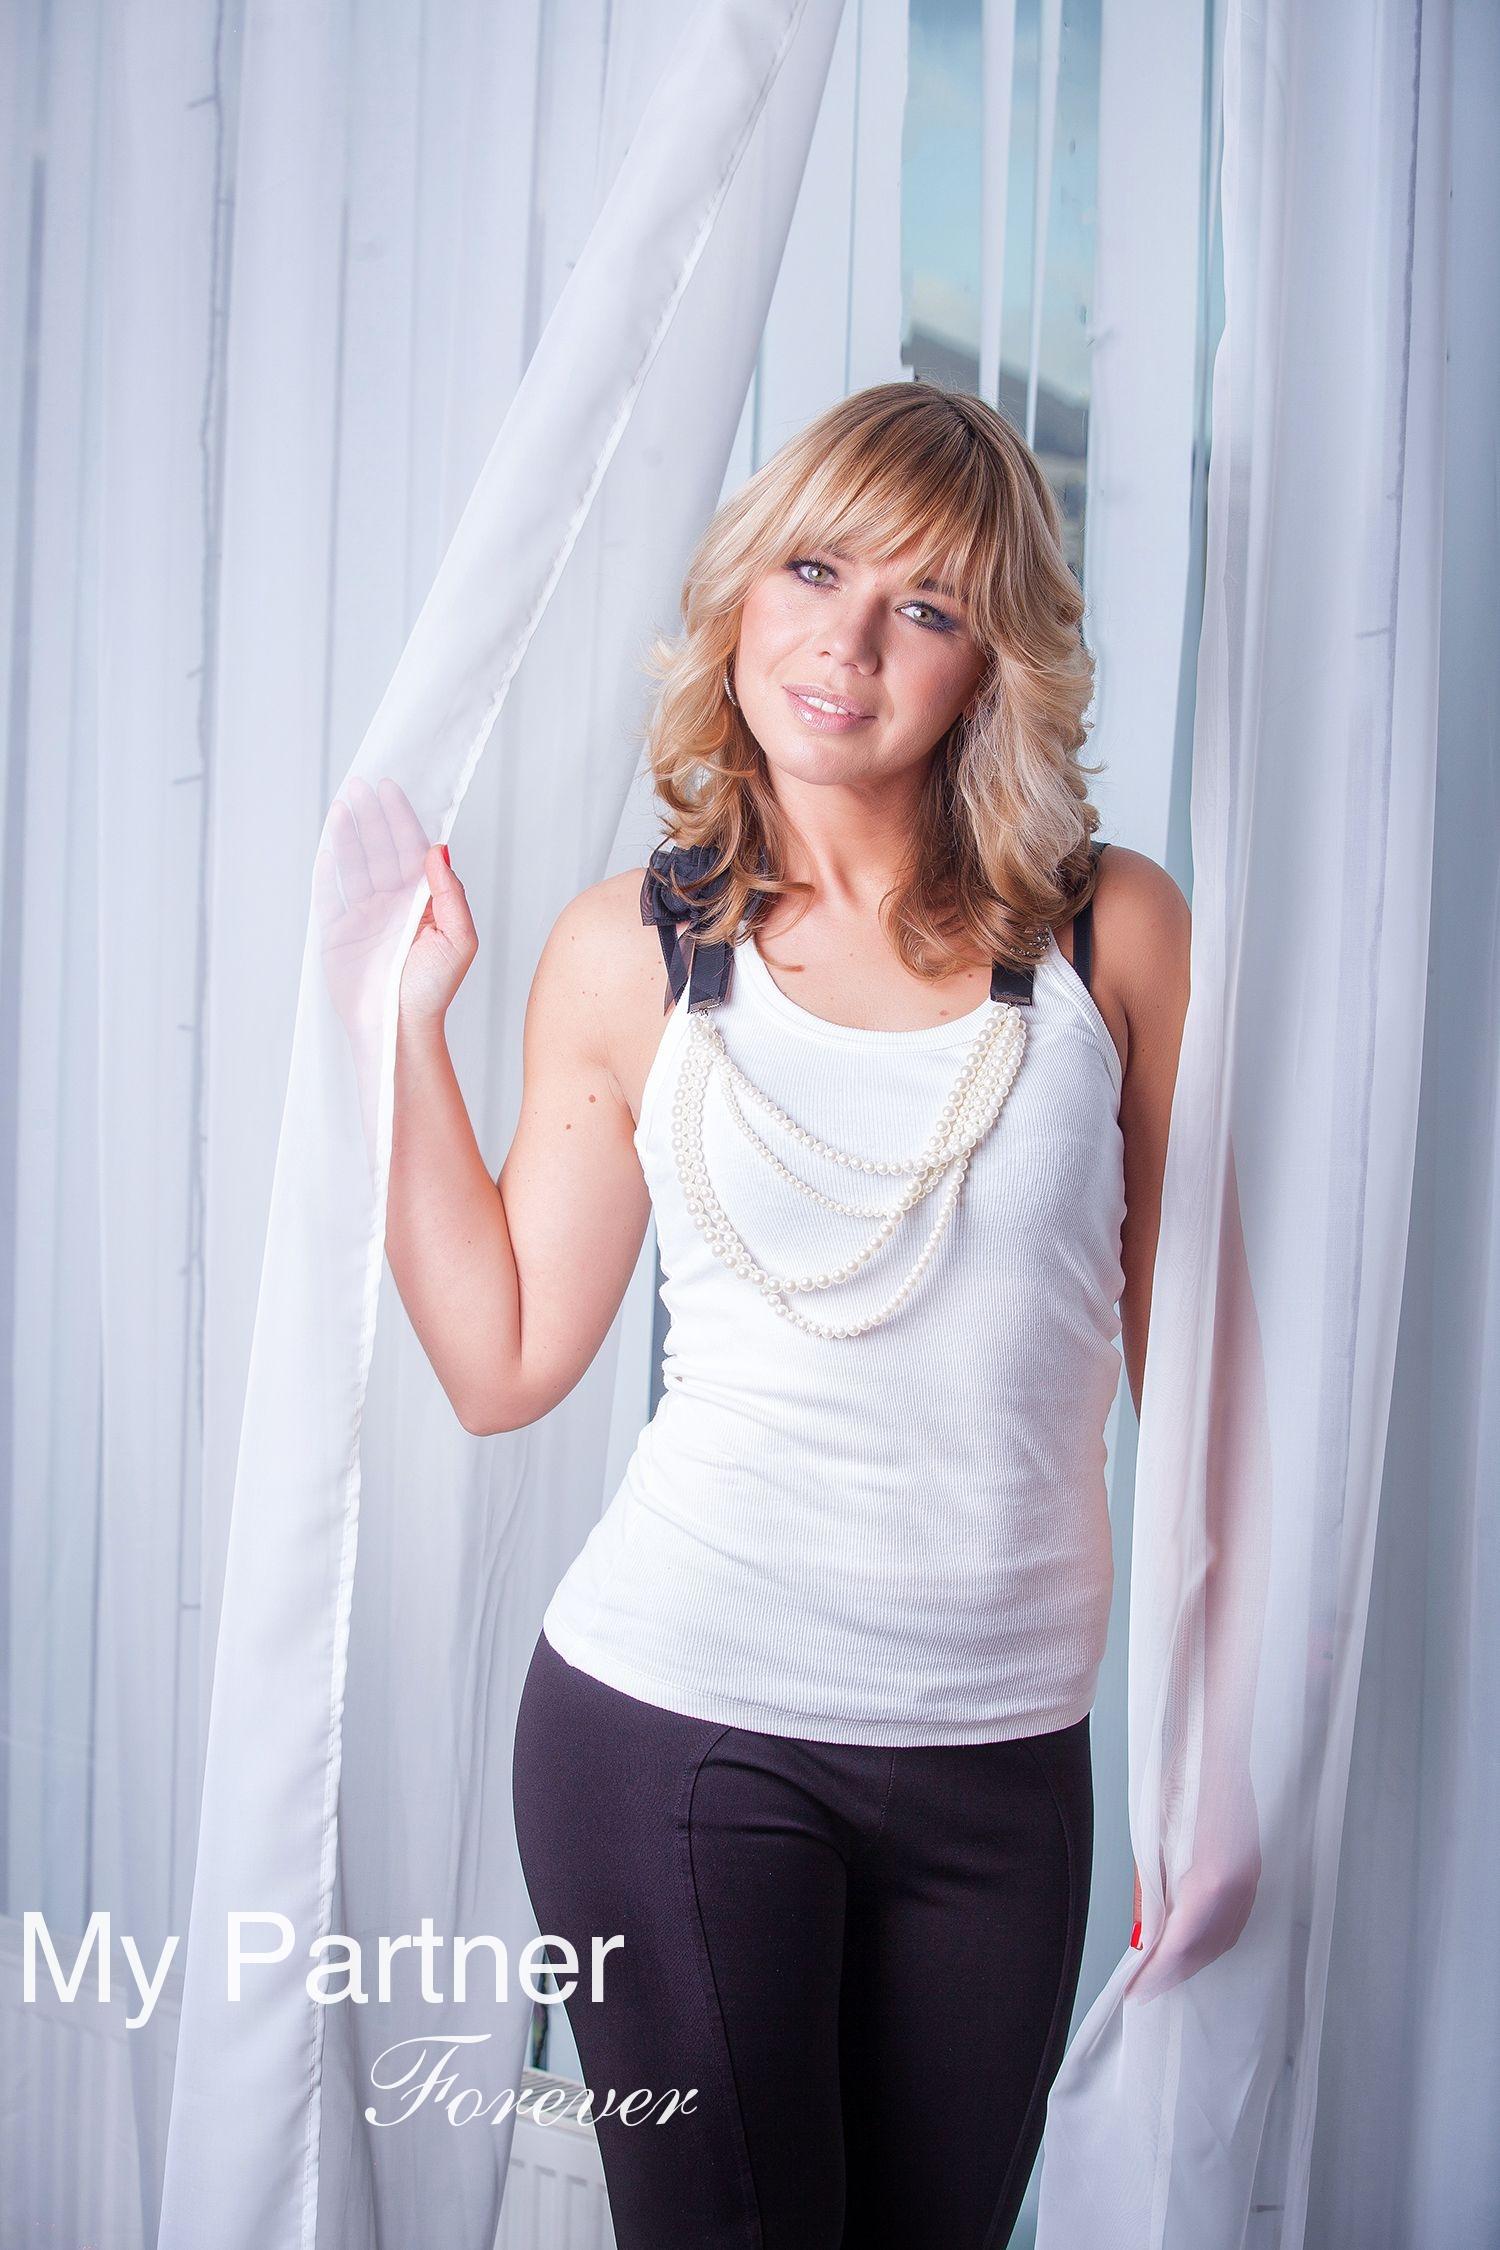 Gorgeous Bride from Ukraine - Oksana from Dniepropetrovsk, Ukraine